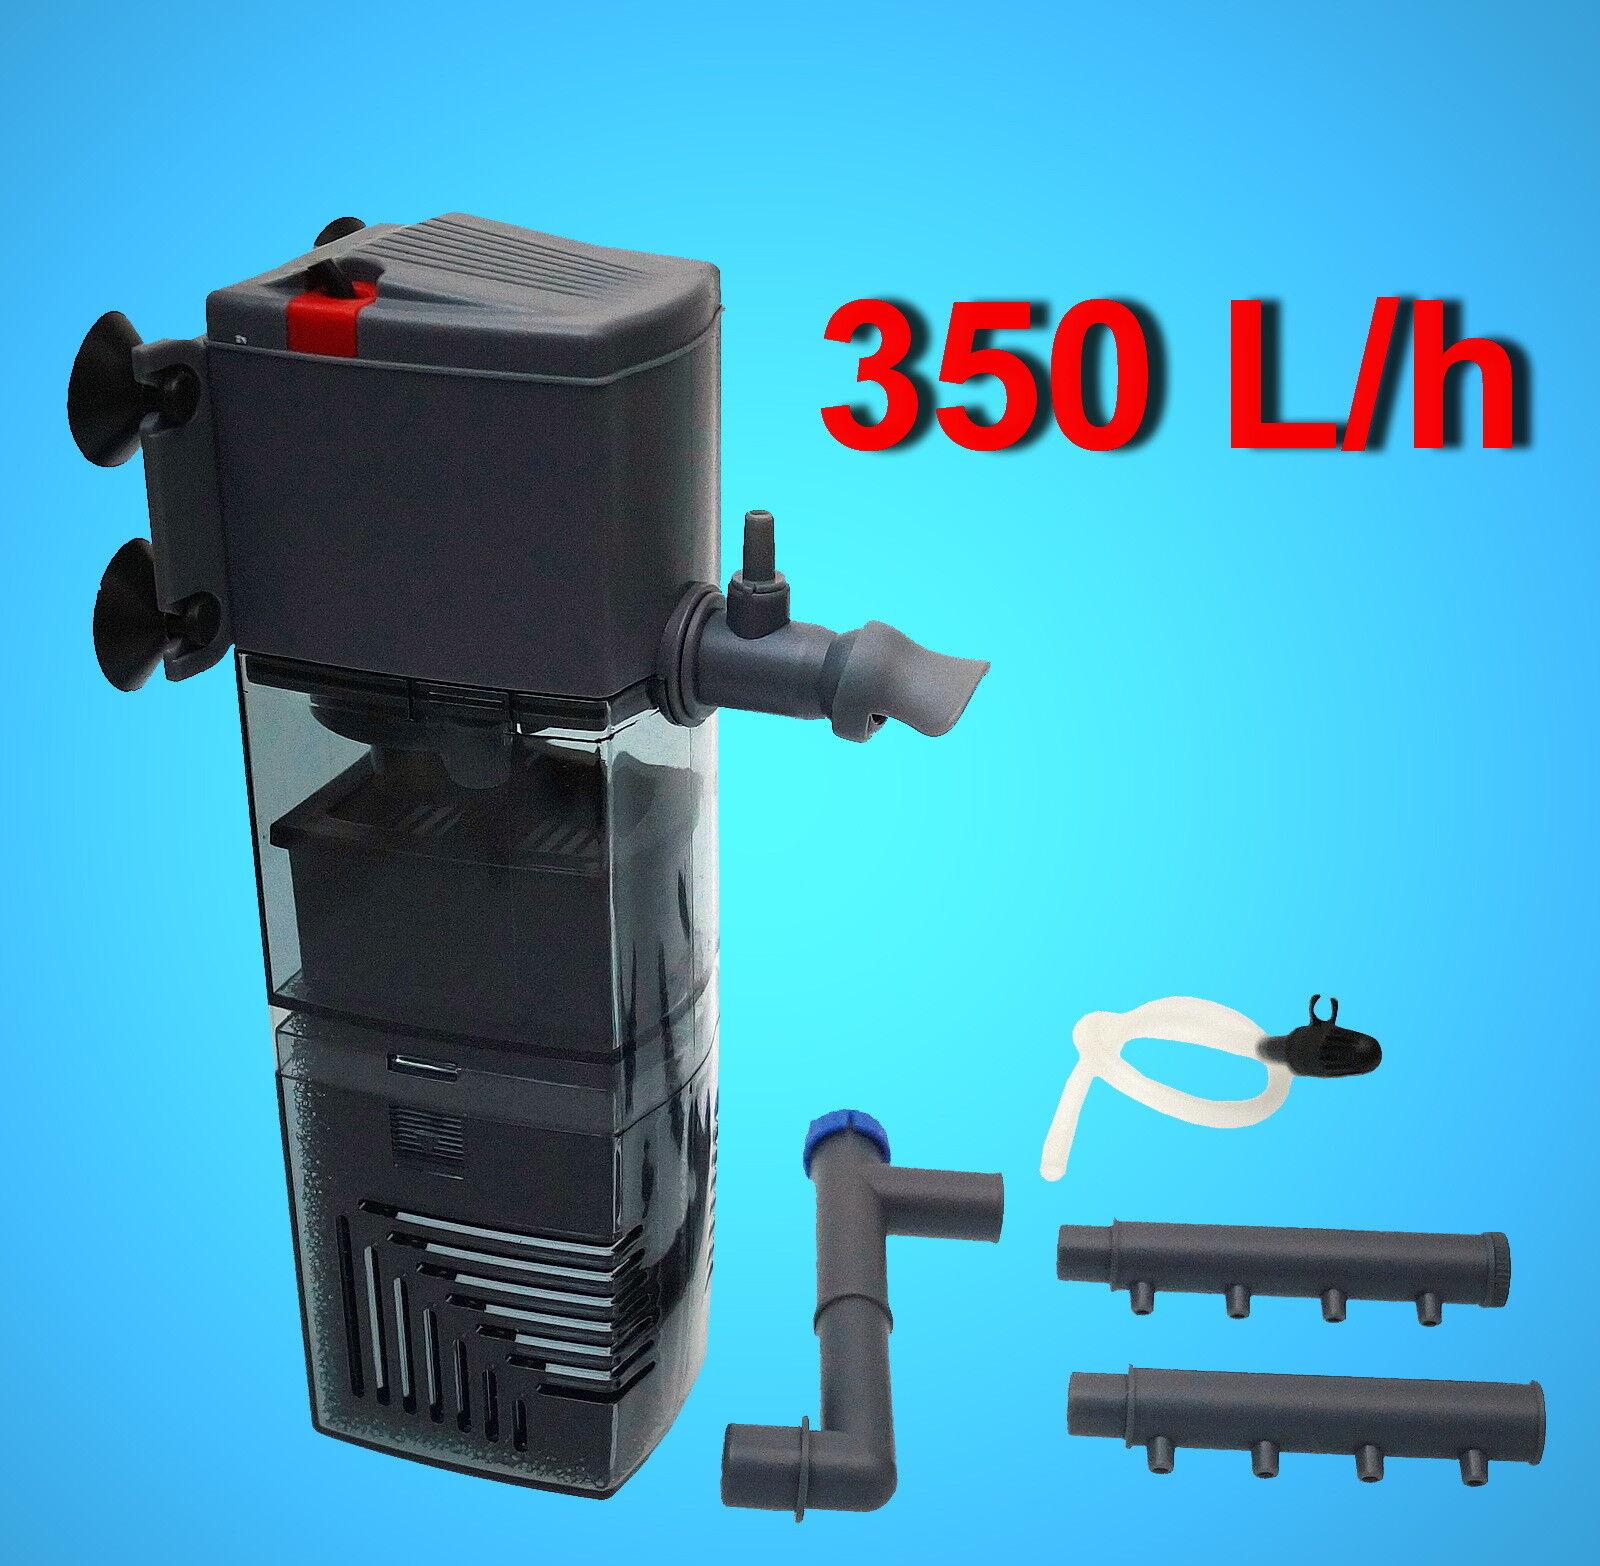 Aquarium 🍀 INNENFILTER 60-120 L🍀 ✚ Zubehör Aquariumfilter Pumpe Aktivkohle